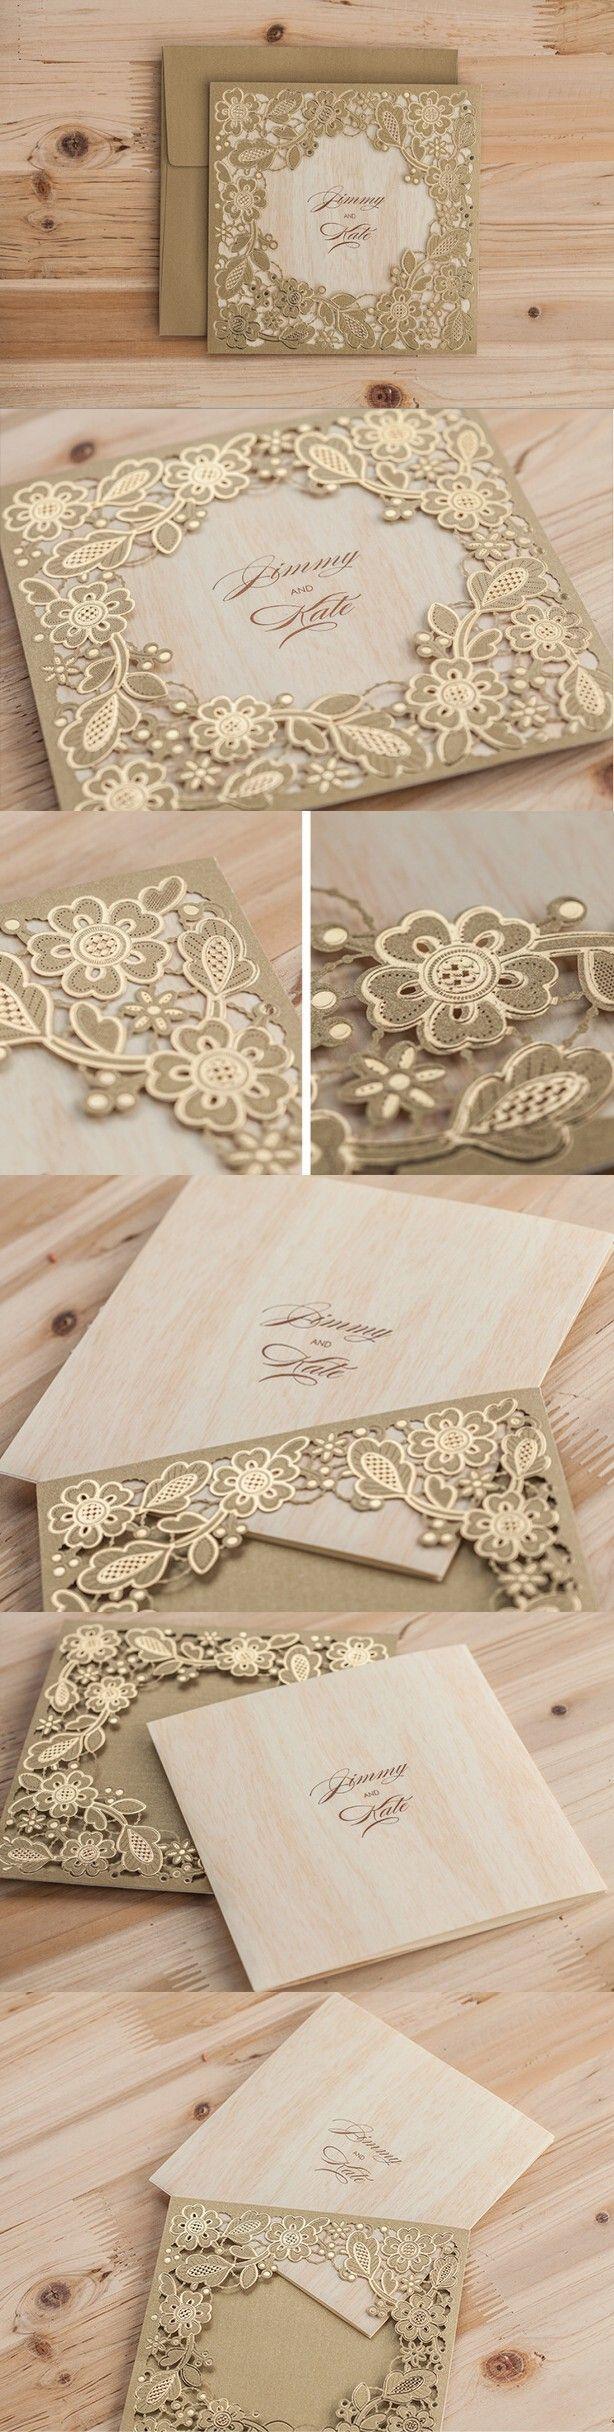 2016 Golden Flower Wedding Invitations, Lace Invitation Cards, Laser Cut Wedding Invitations Meter Gold Free Printing